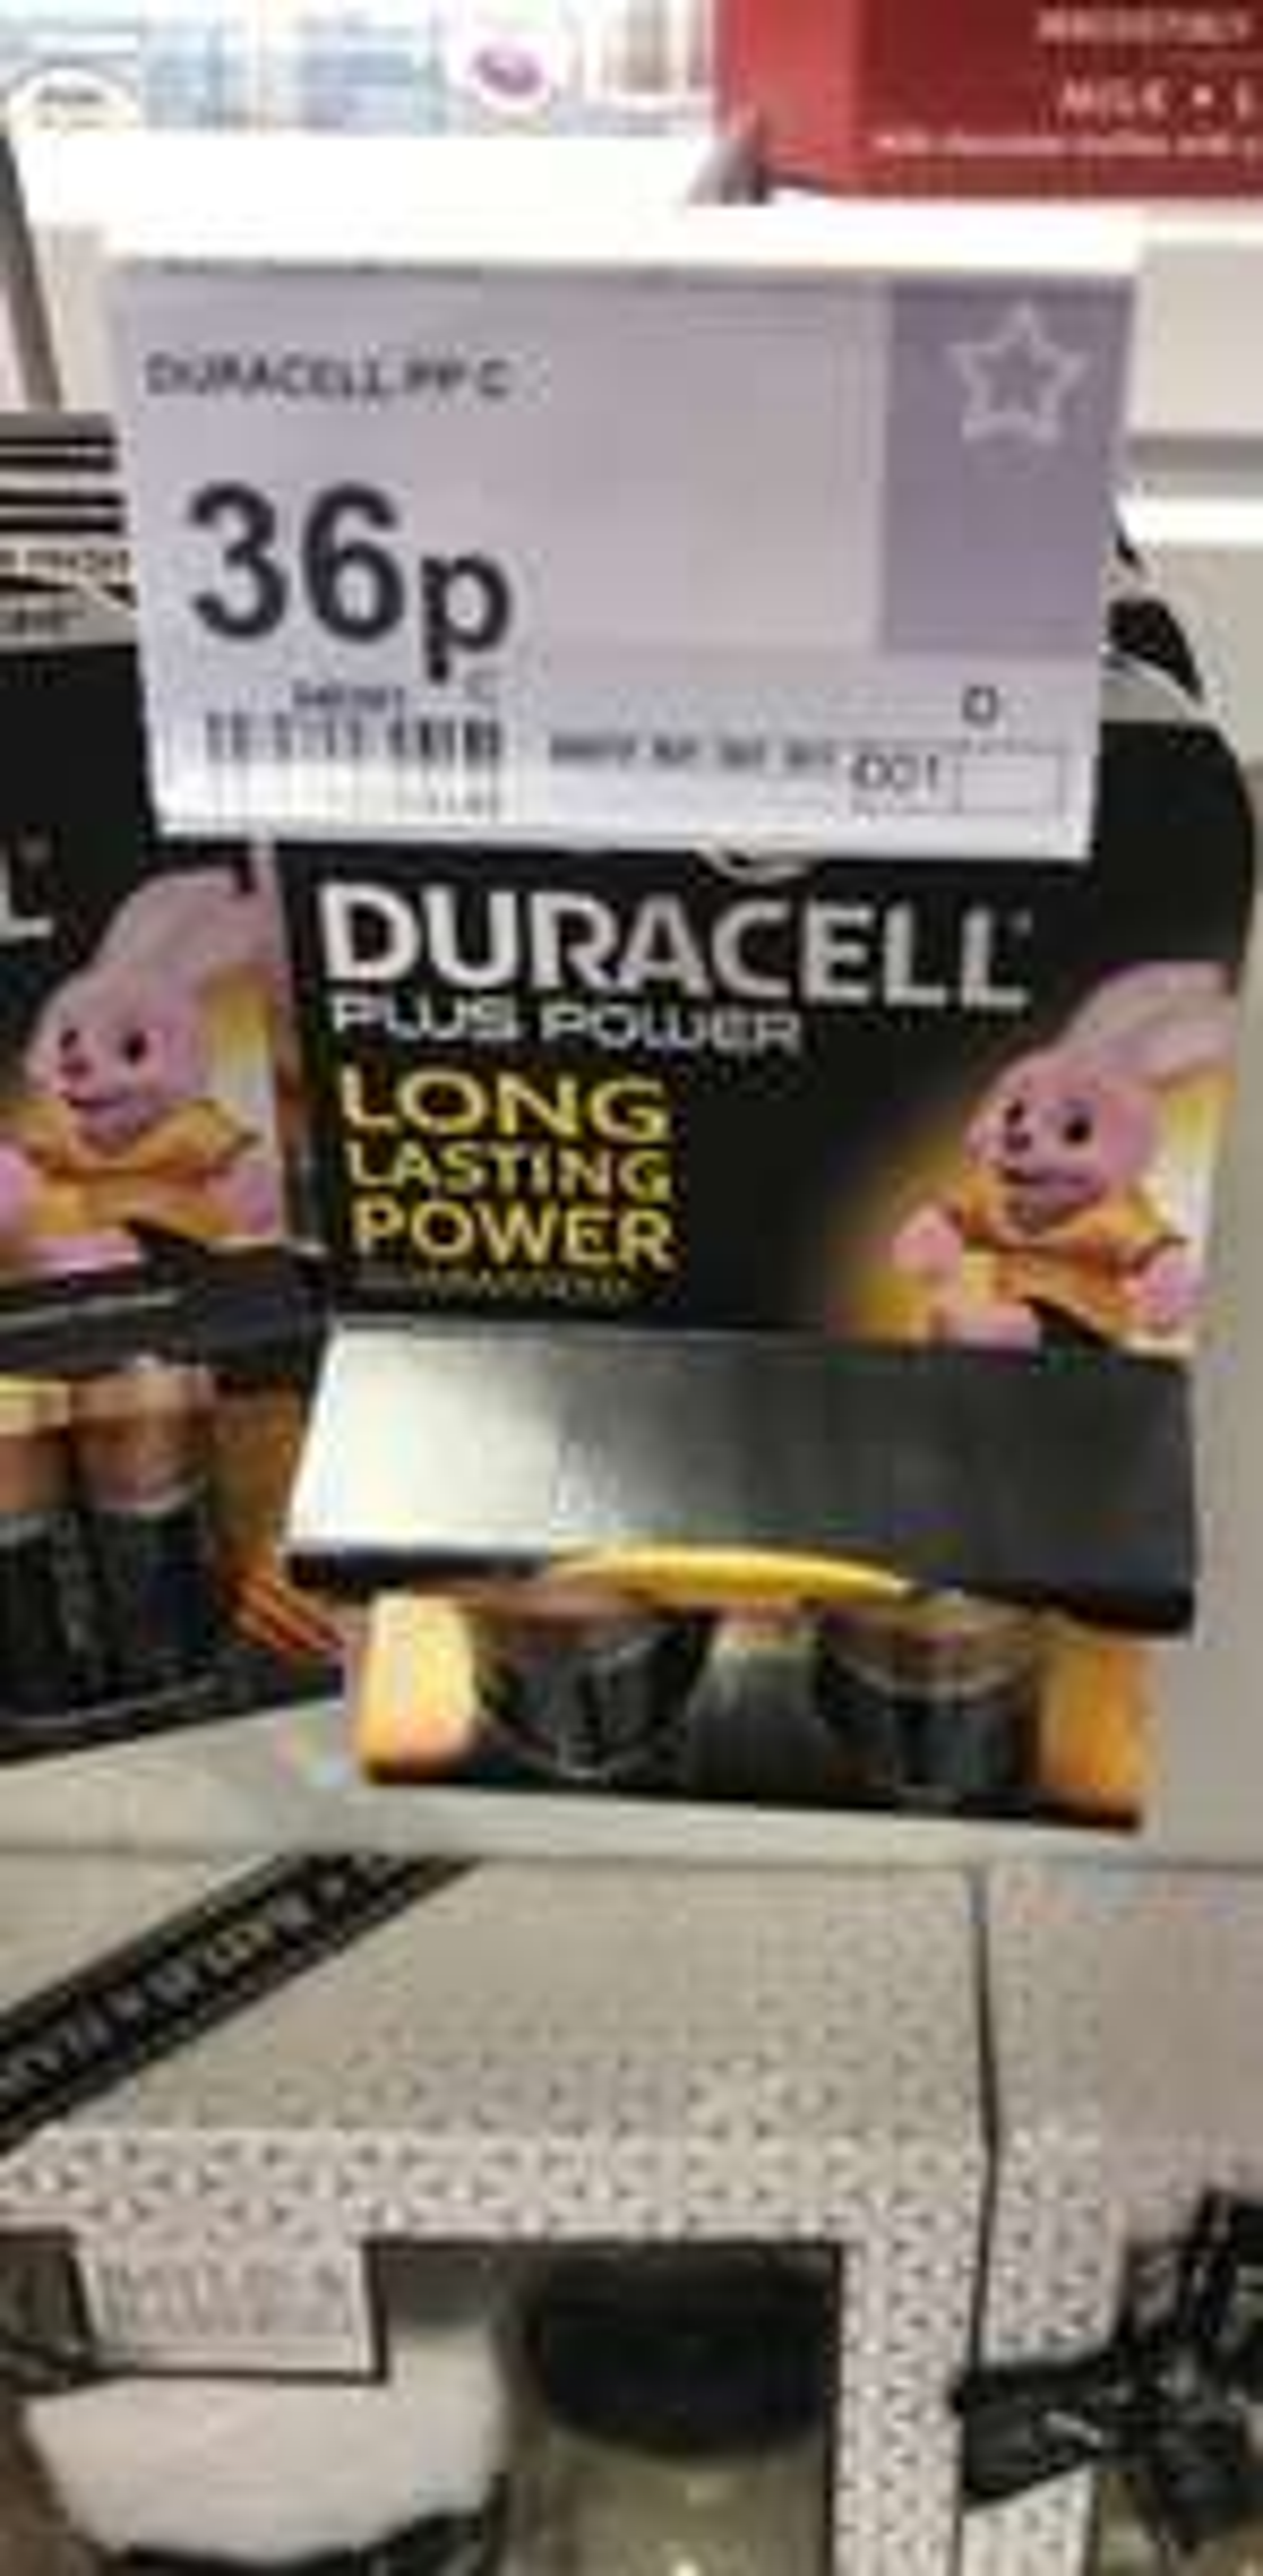 Duracell plus power (long lasting power) C batteries 2pk 36p instore @ Superdrug Swansea